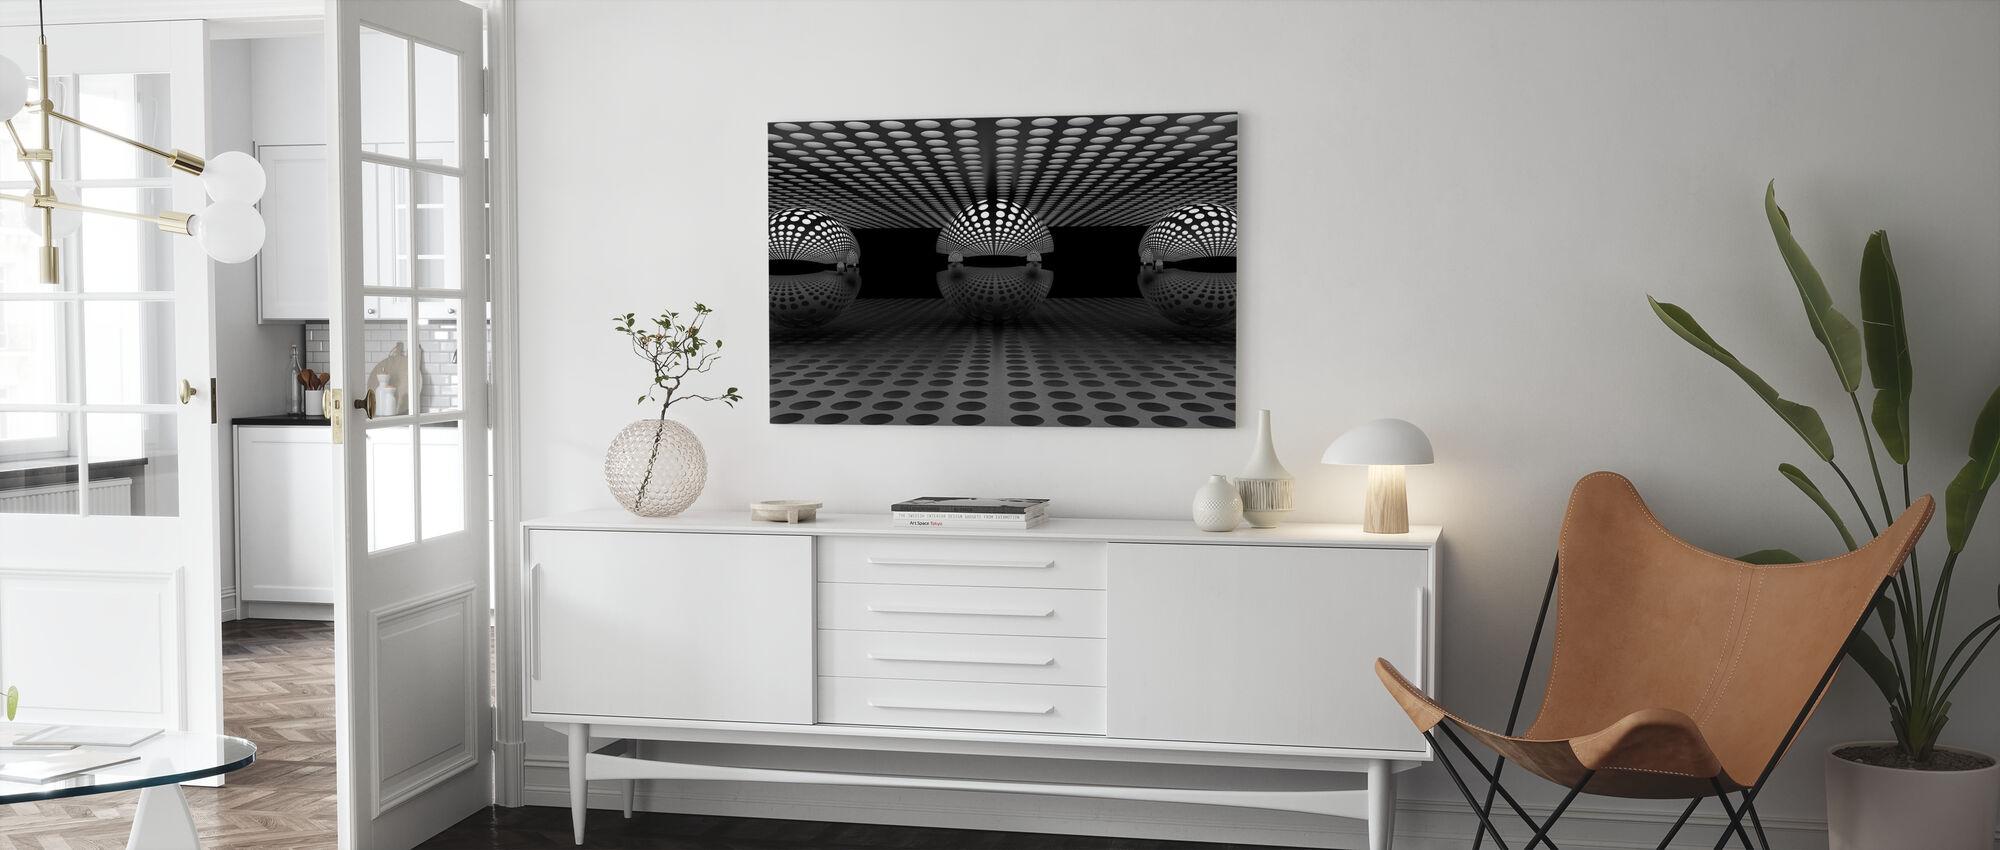 Pacman Familj - Canvastavla - Vardagsrum